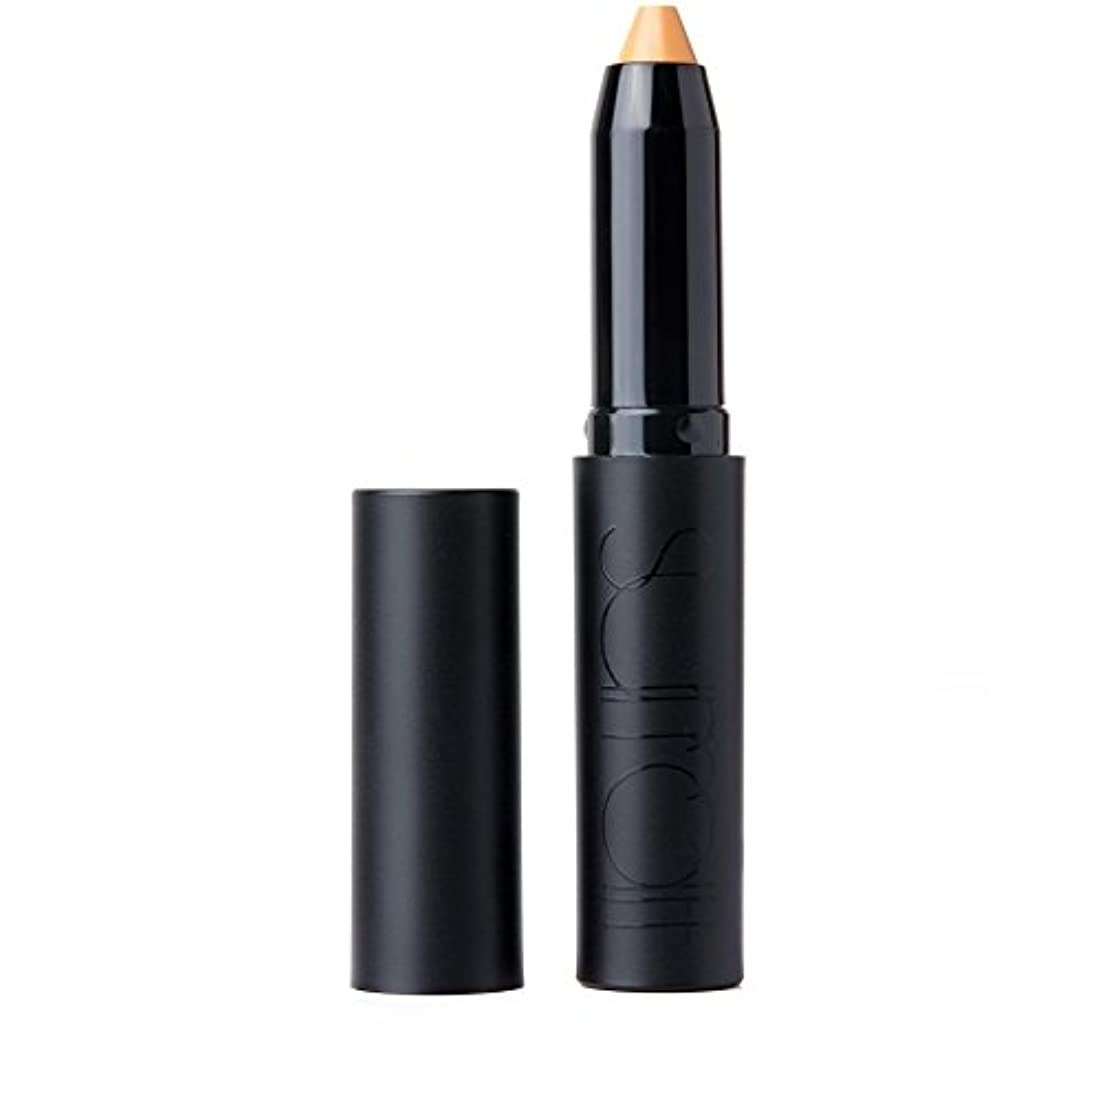 Surratt Lip Crayon 15 Stark Naked (Pack of 6) - 裸15スタークリップクレヨン x6 [並行輸入品]